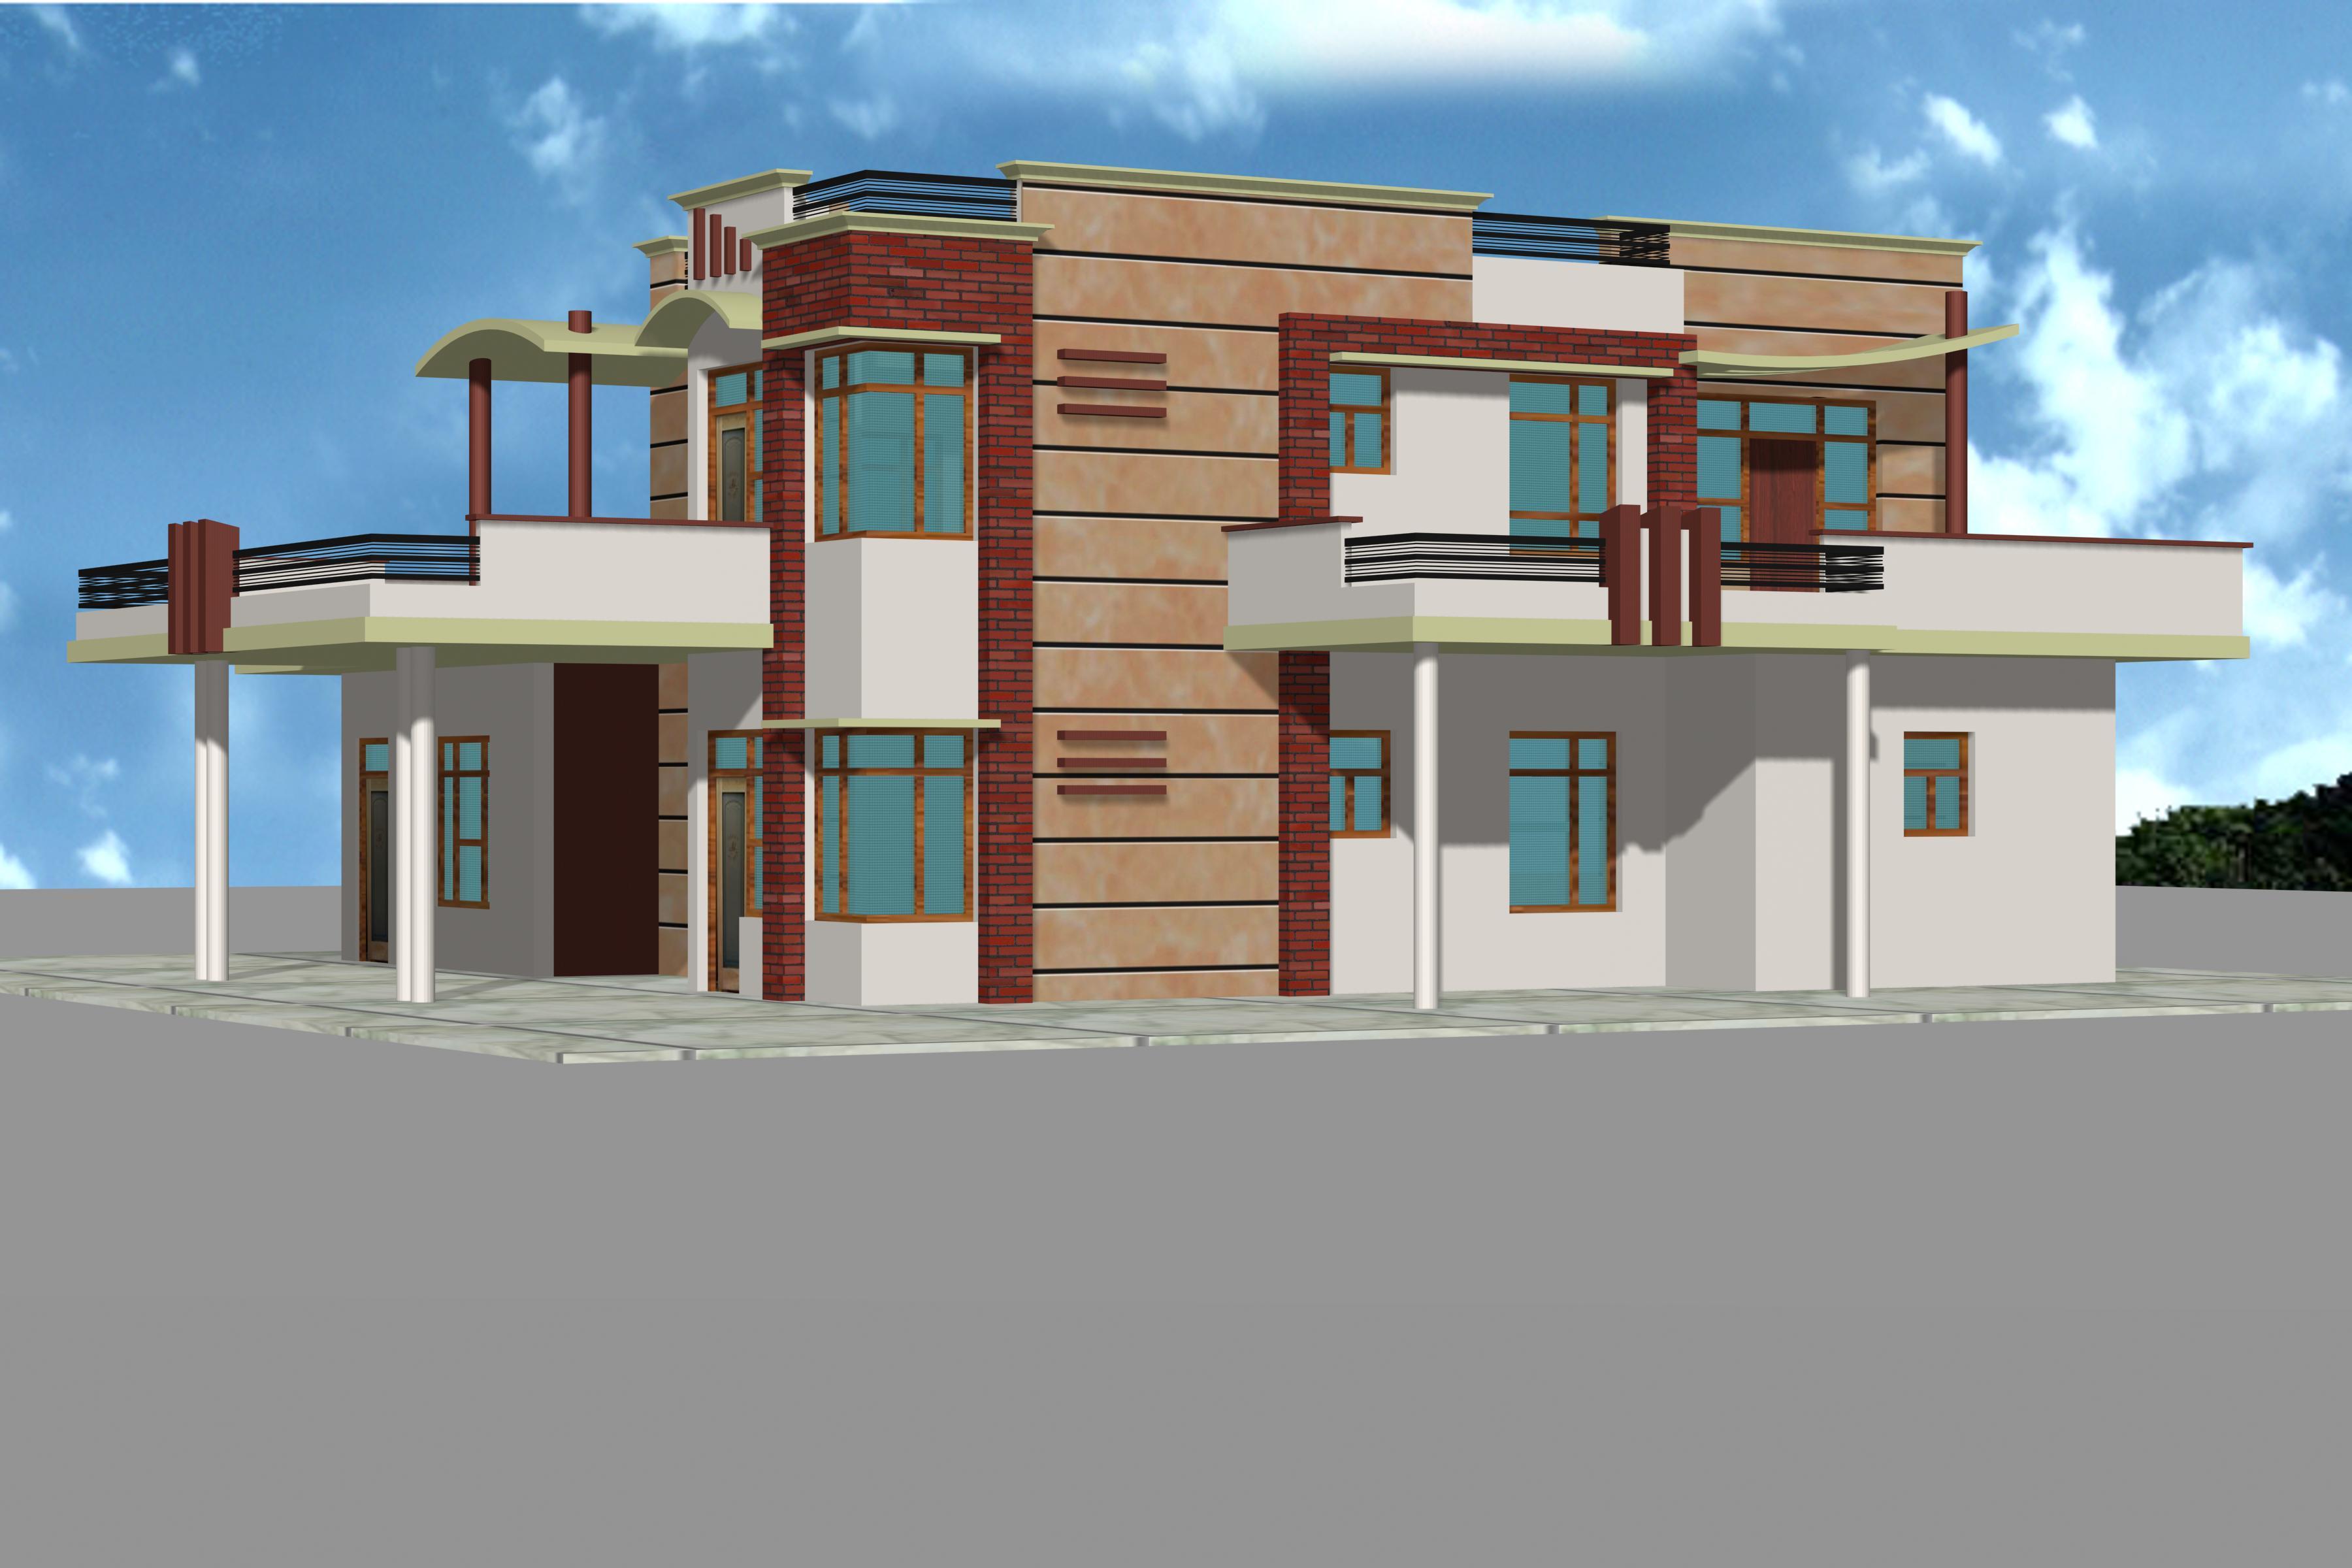 Duplex house pakthin for Duplex house front elevation designs